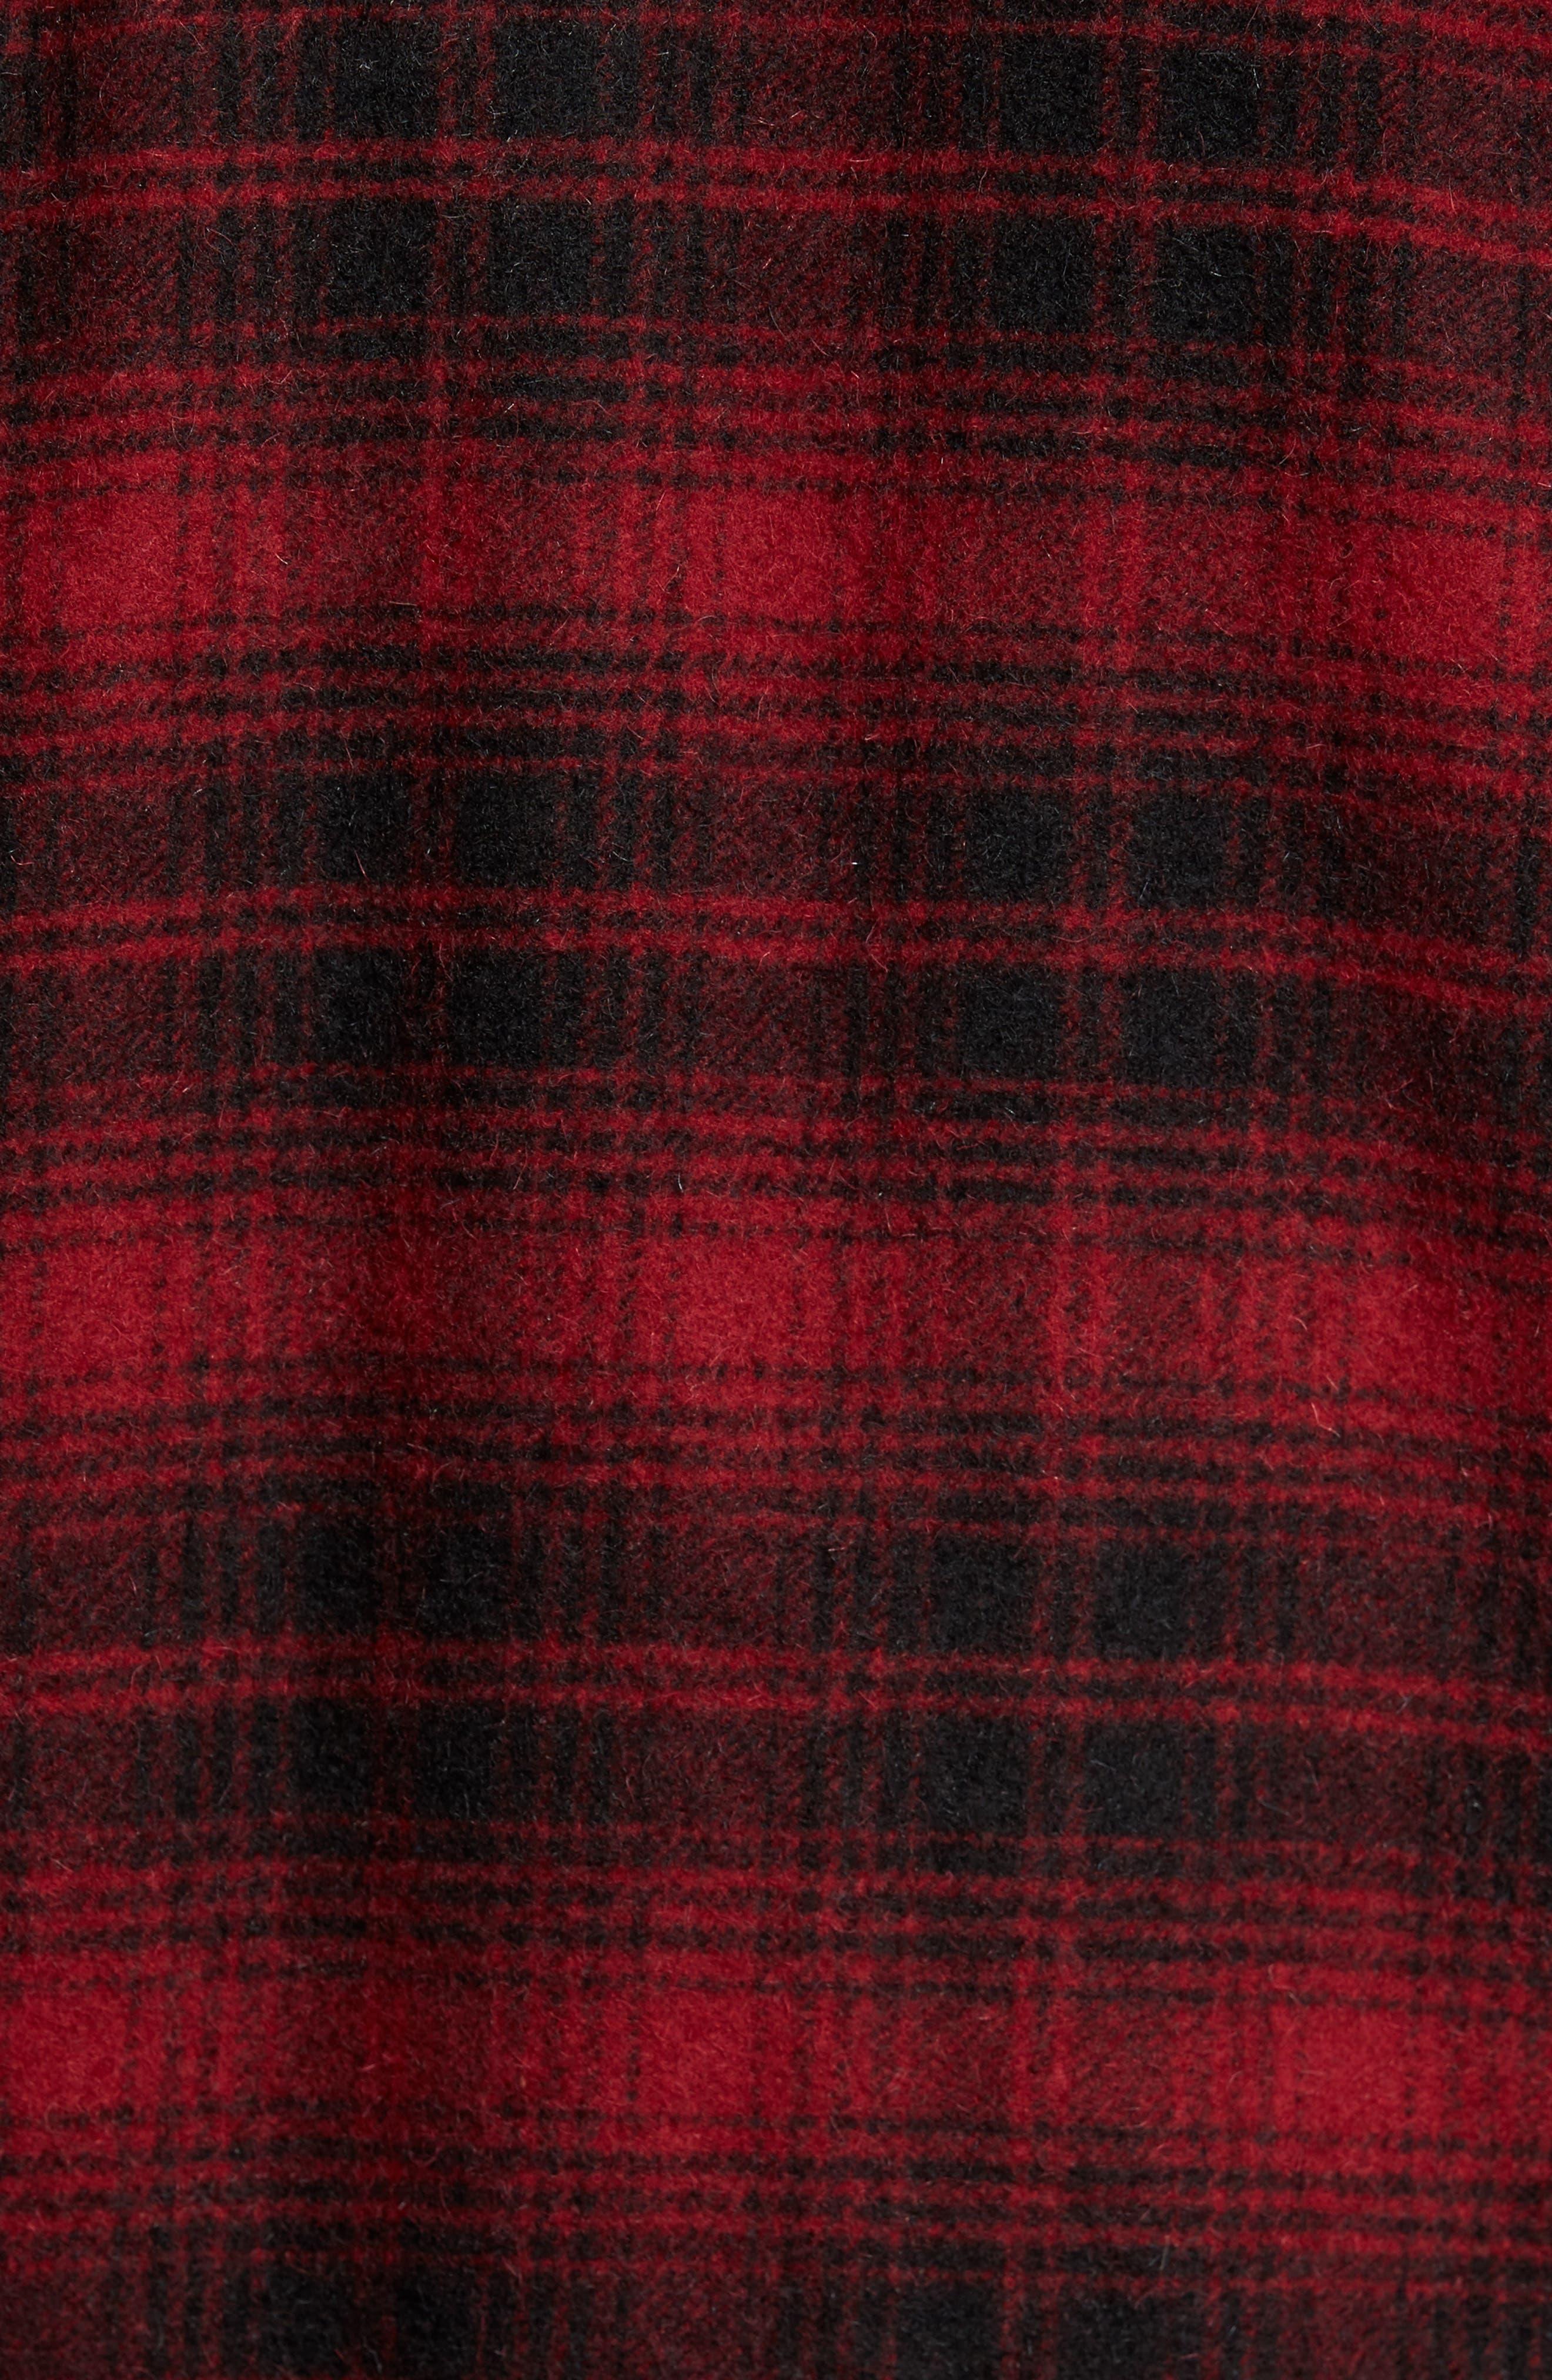 Hunter Jack Wool Blend Shirt Jacket,                             Alternate thumbnail 6, color,                             618